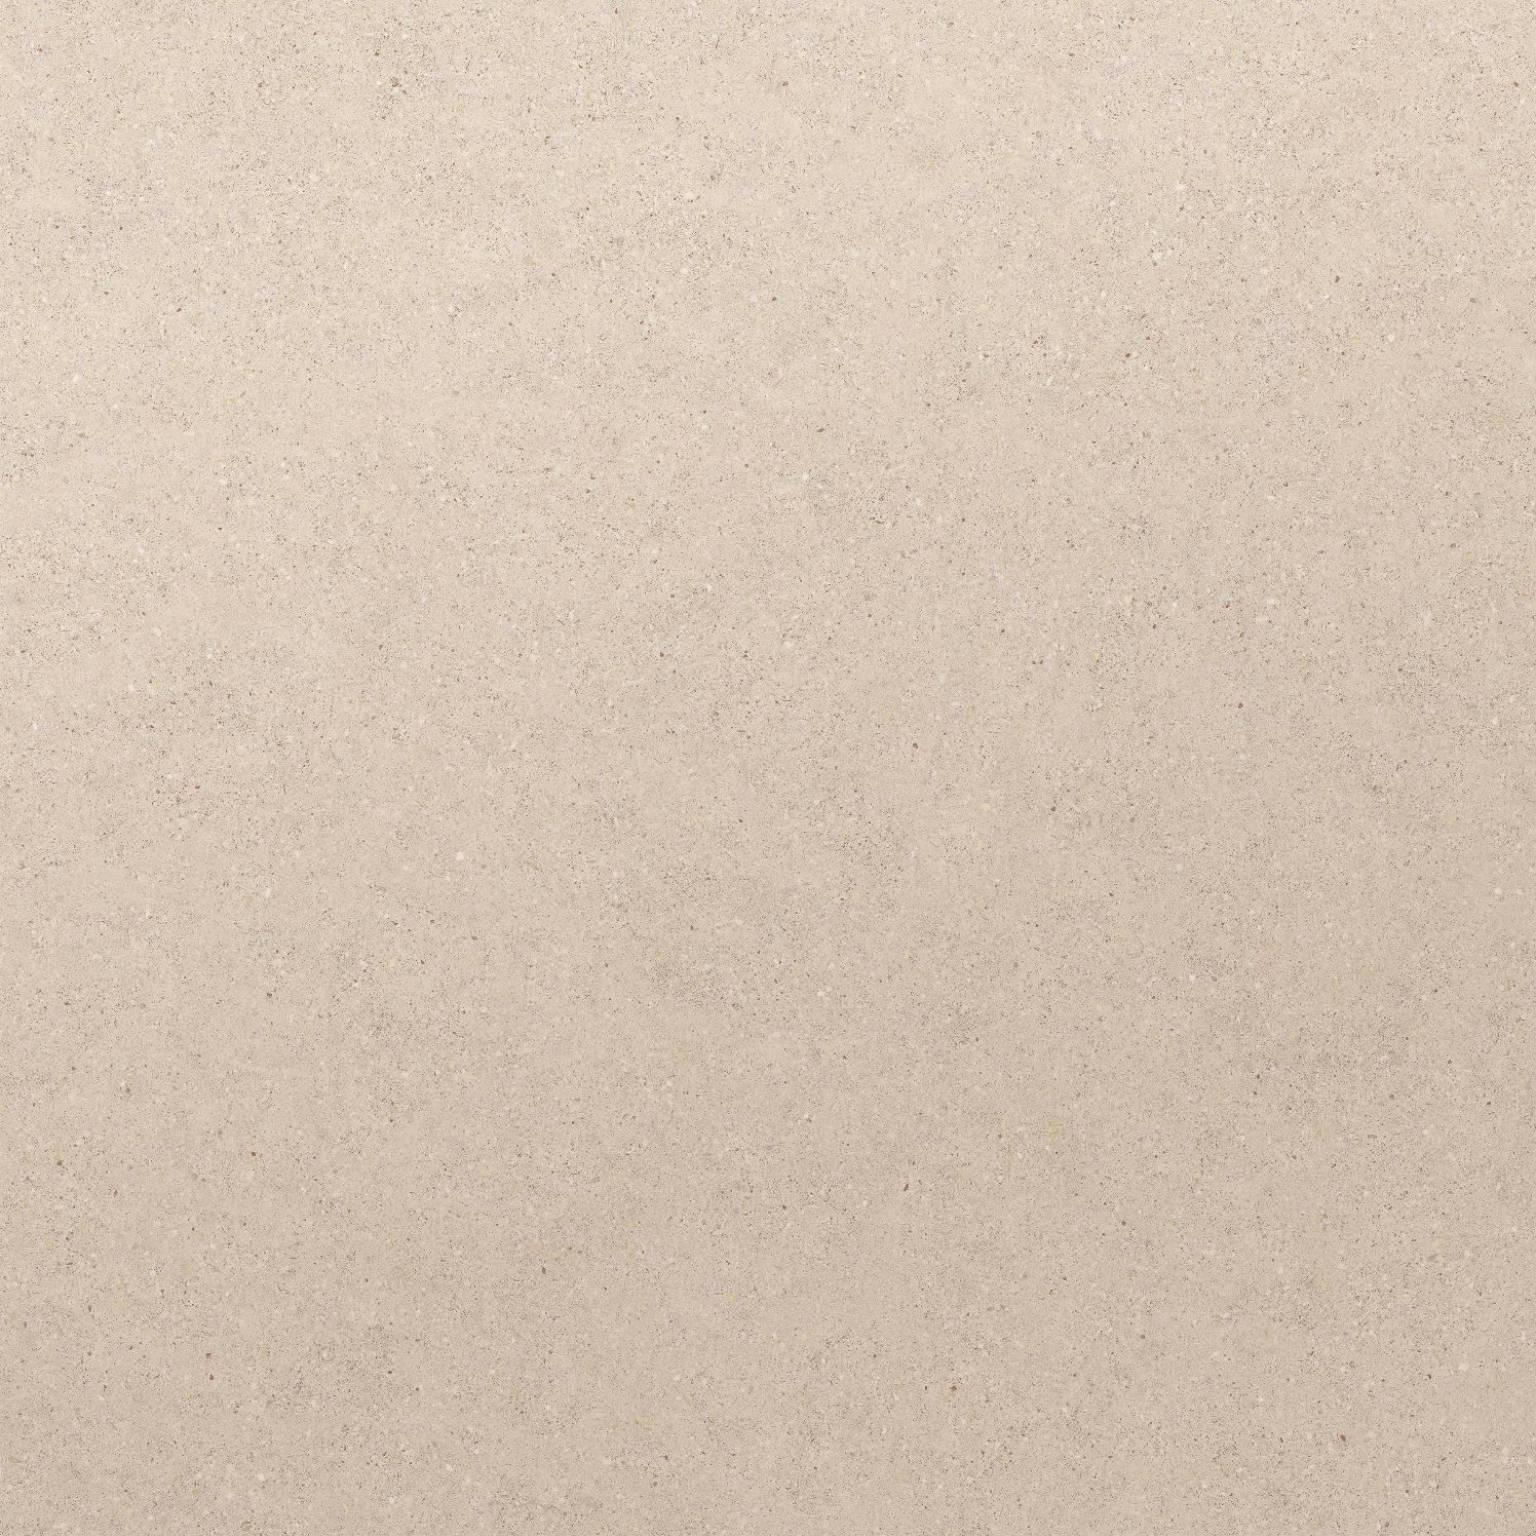 Battuto Sand 90x90 | Newker